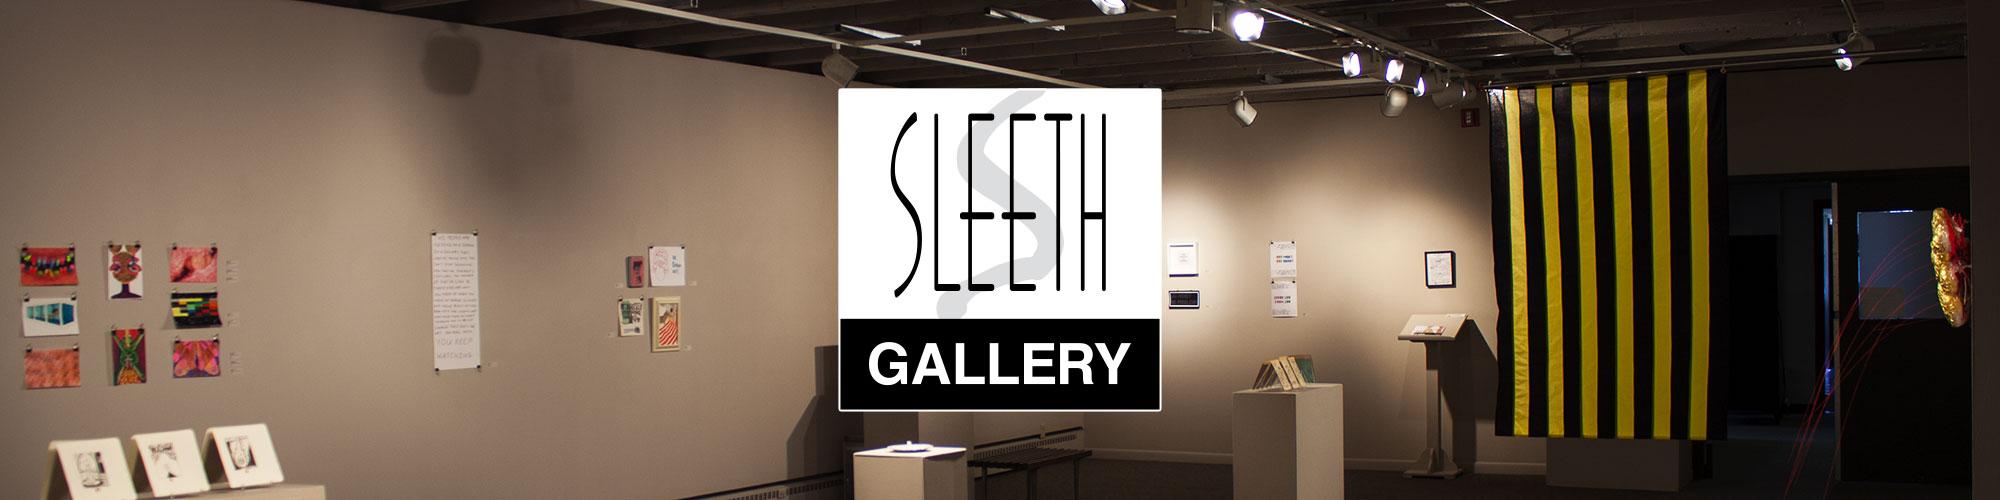 Sleeth Gallery – WVWC